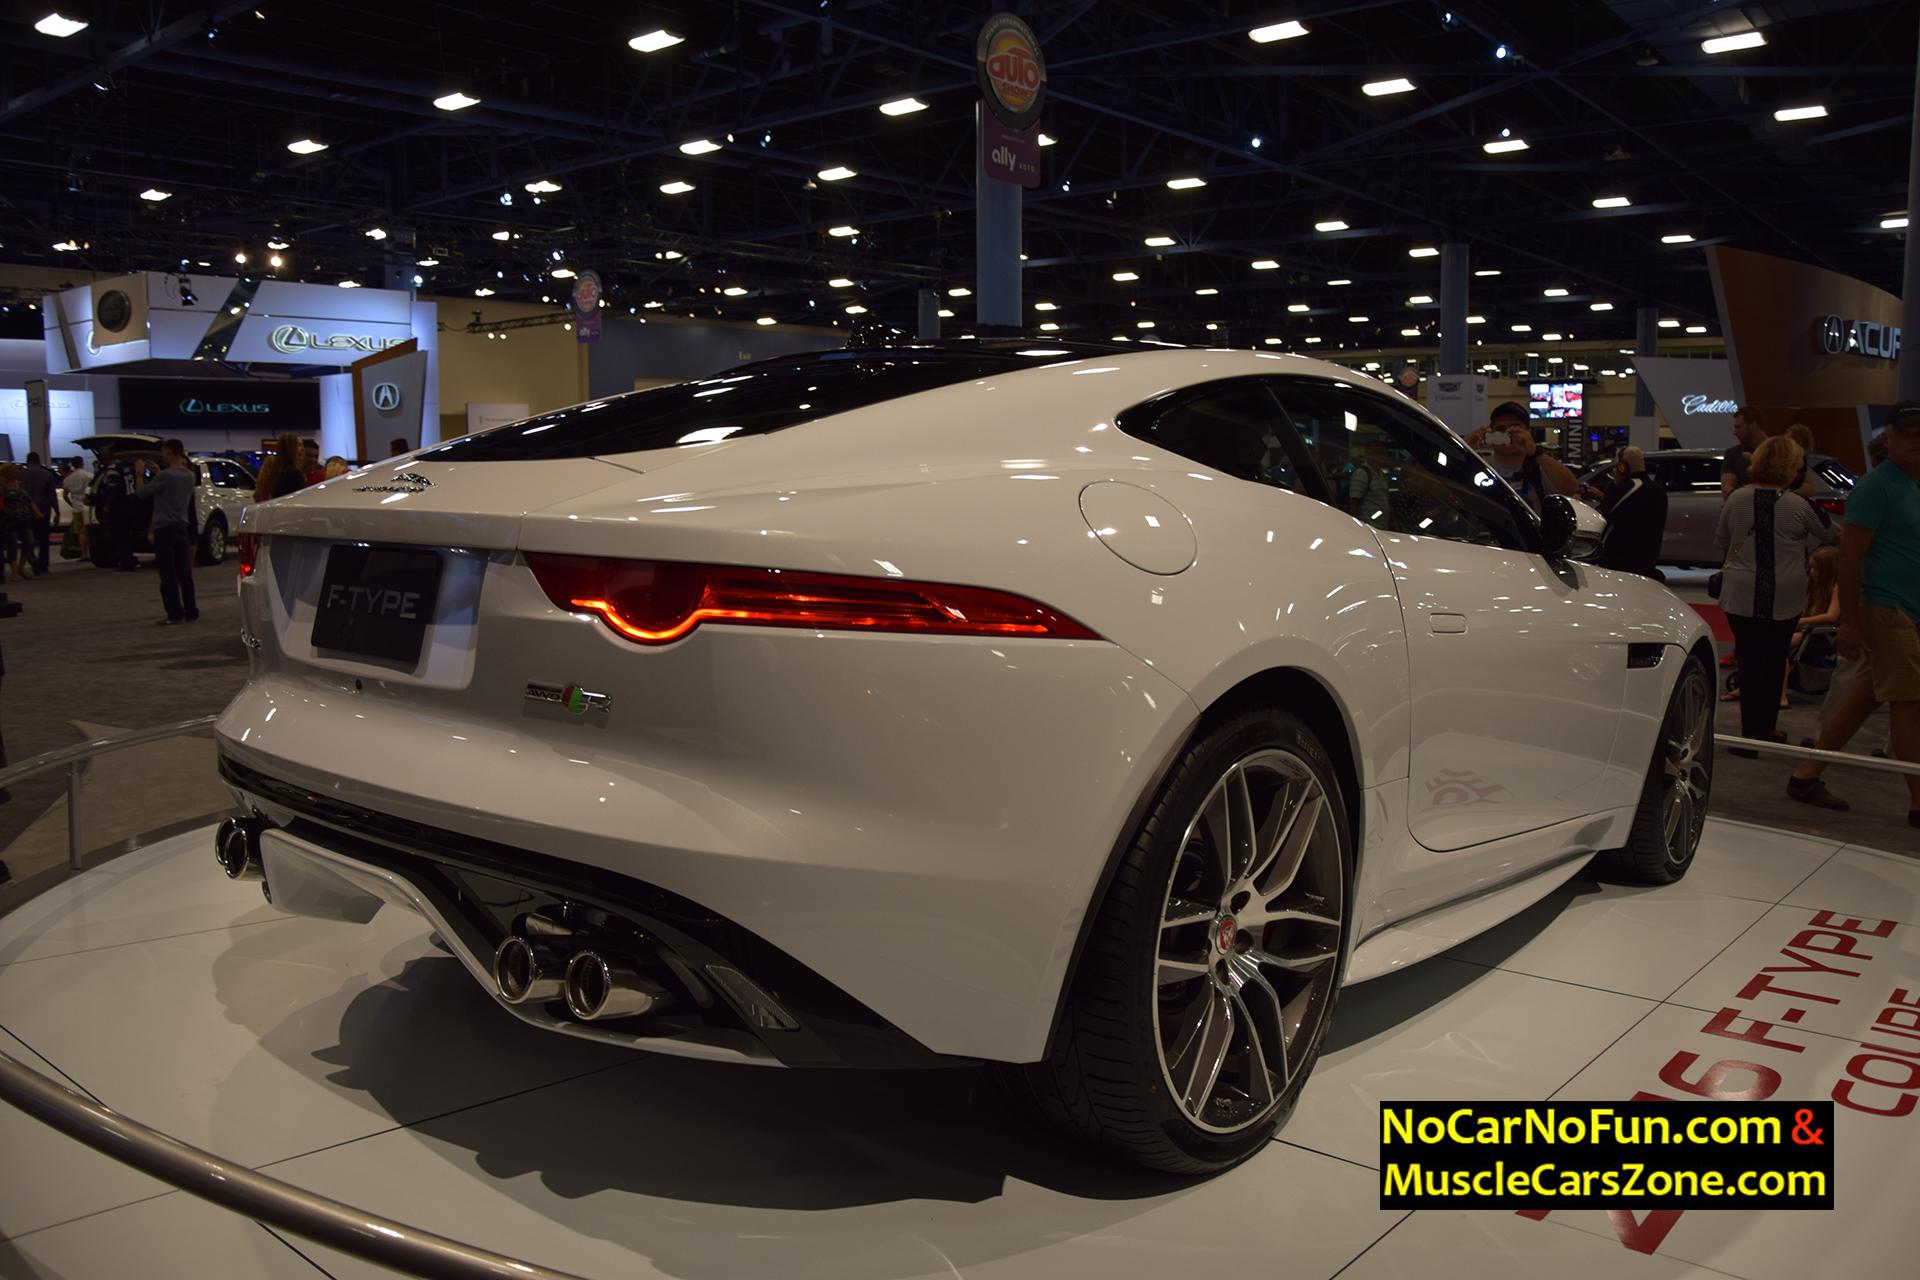 2016 Jaguar F-Type Coupe - Miami Auto Show 2015 2 - Muscle Cars Zone!